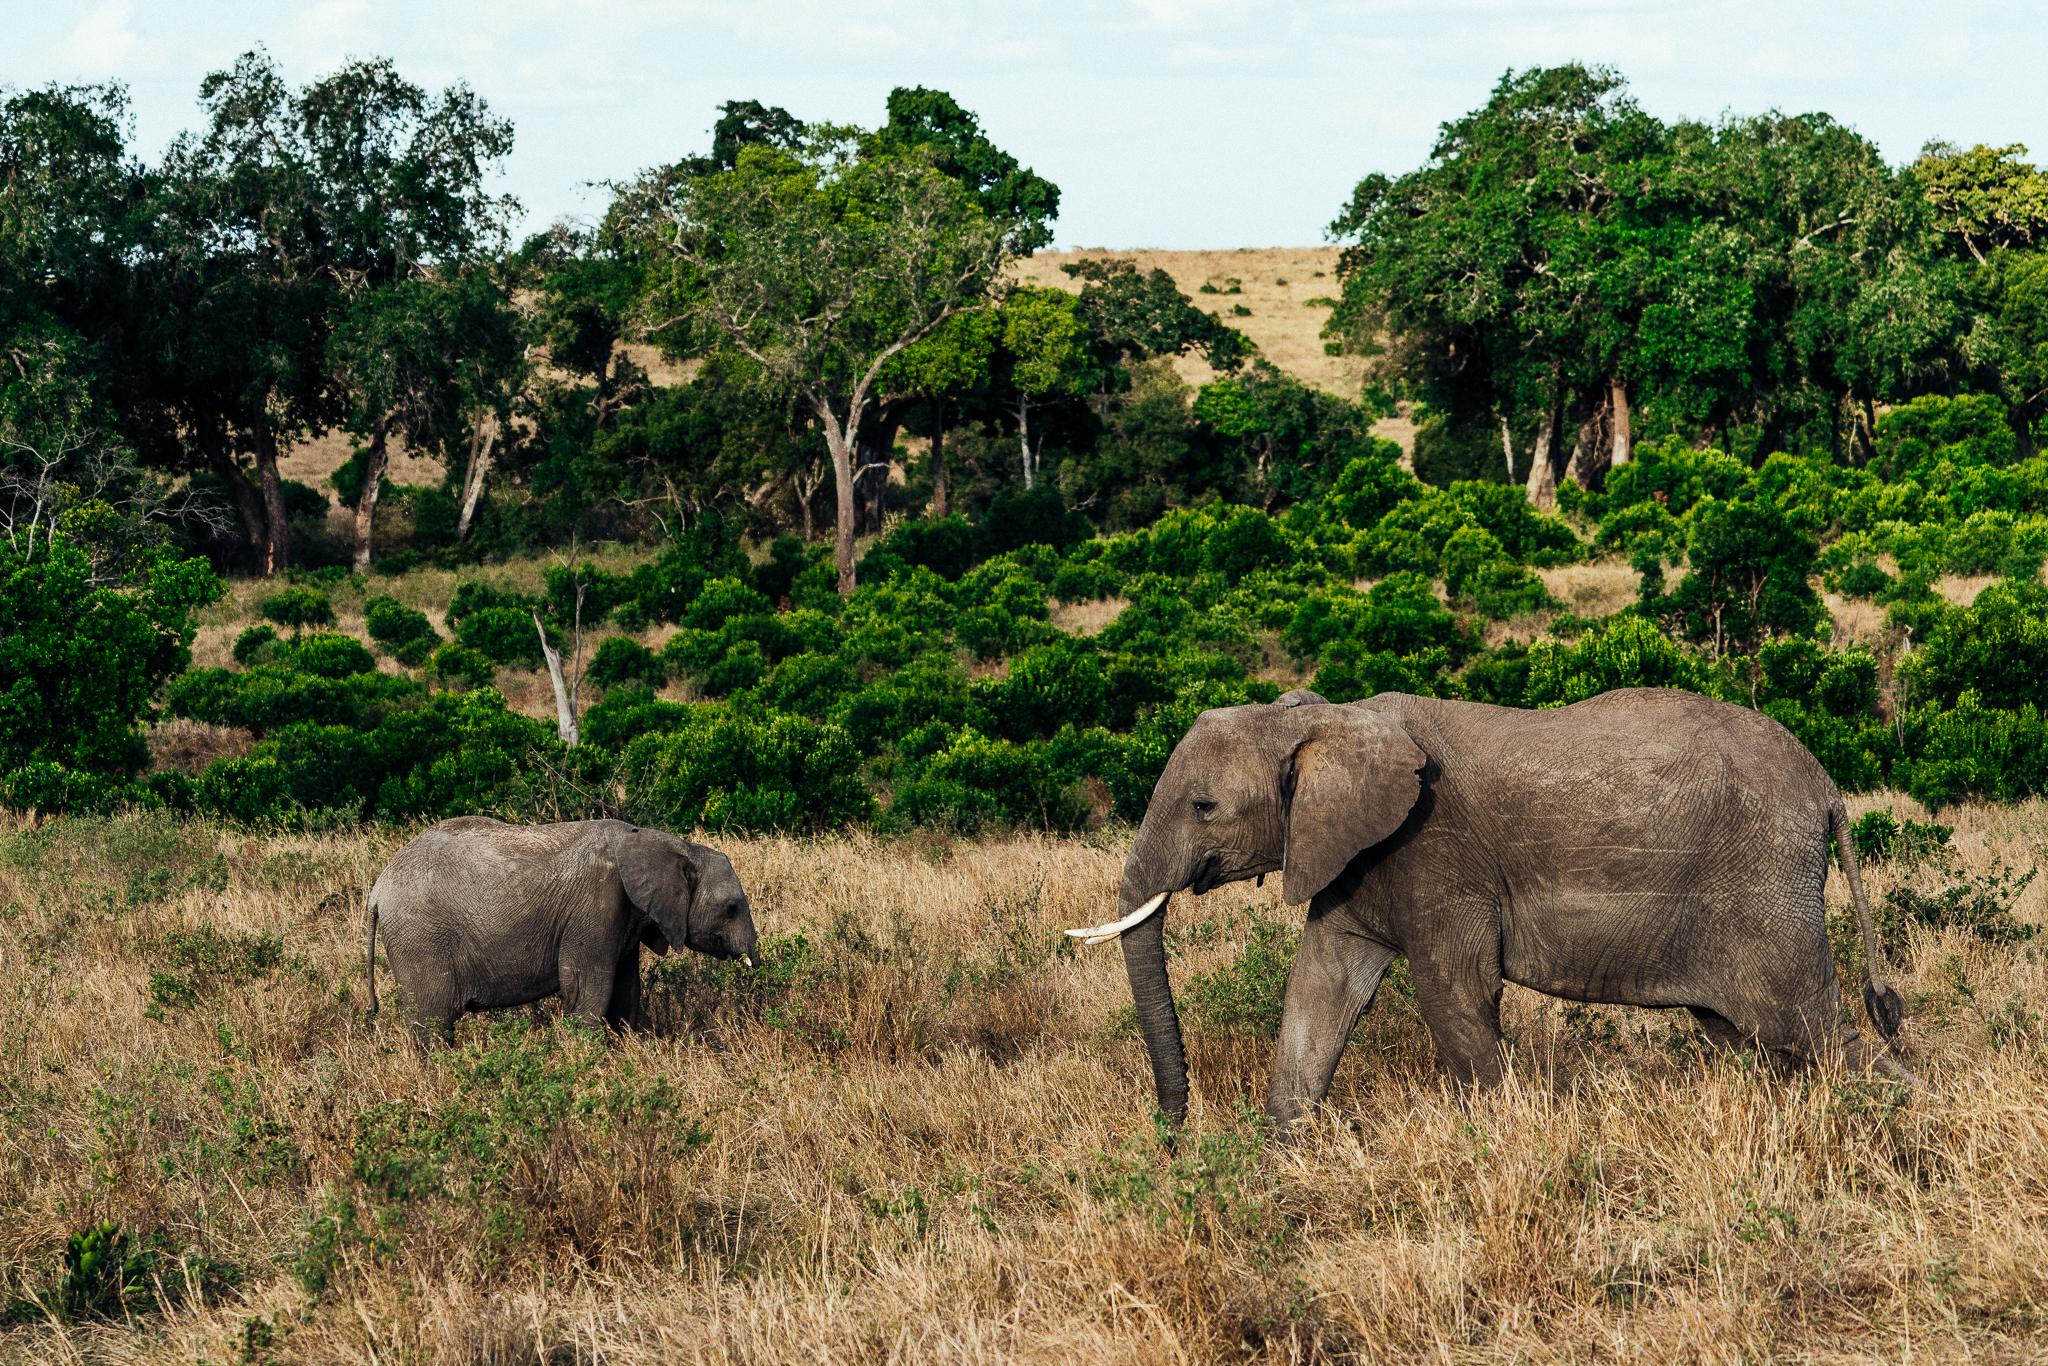 Elephants in the Maasai Mara Ph. Dave Krugman